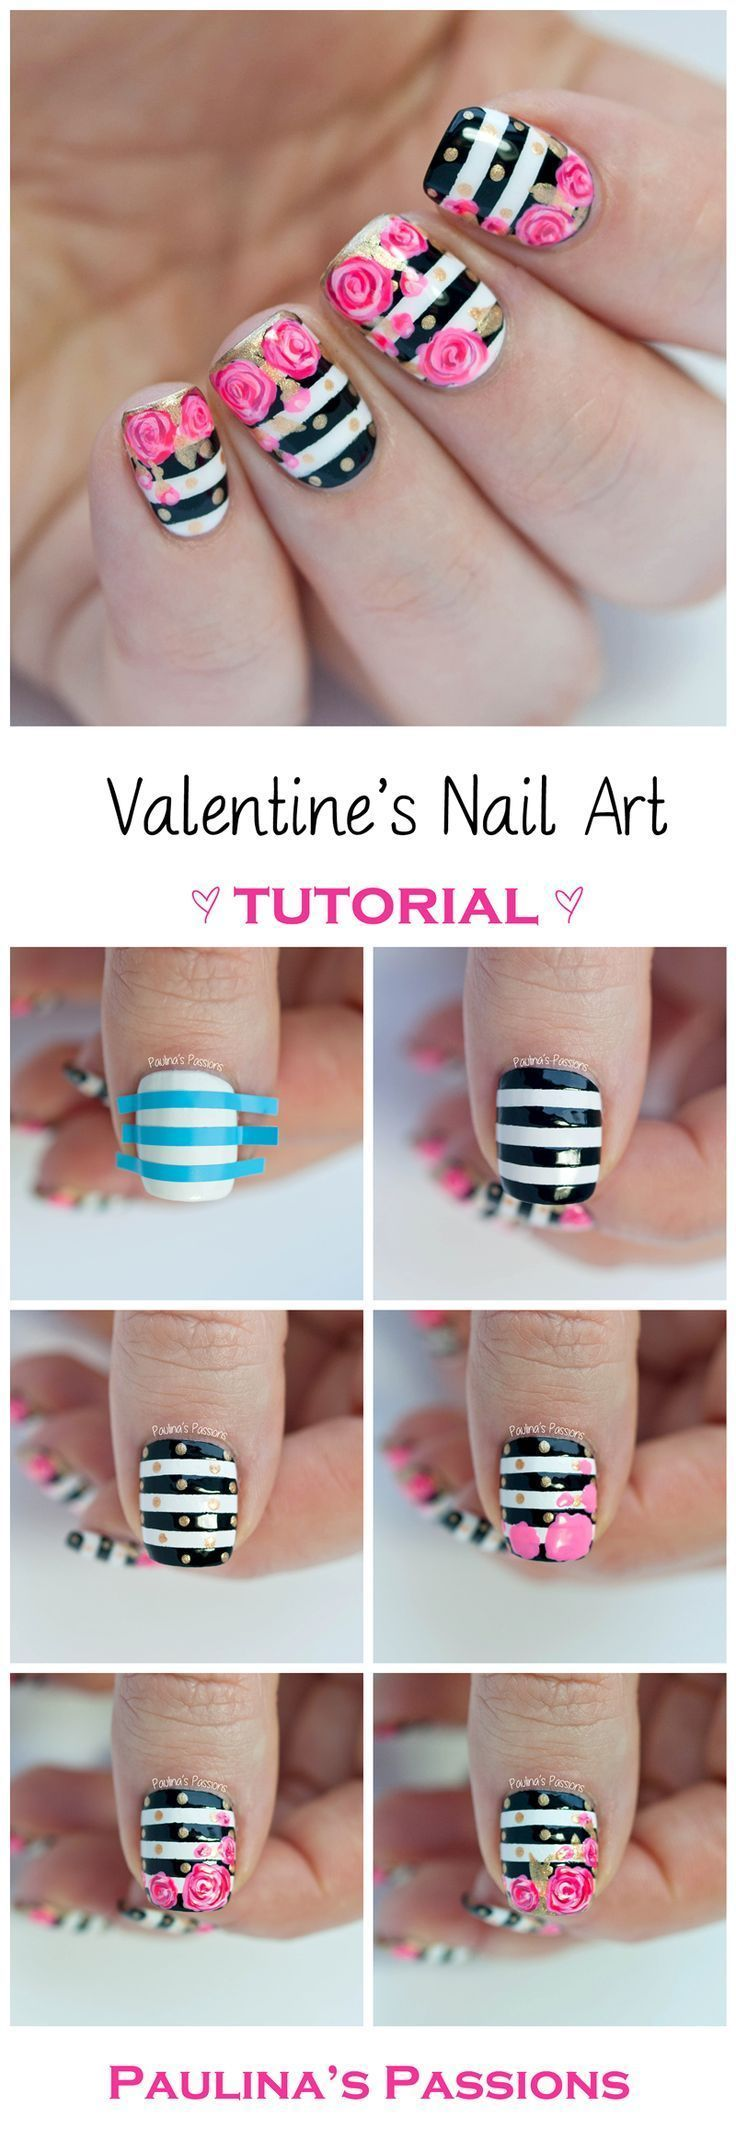 cool 36 Easy Nail Art Tutorials For Beginners 2015 - Pepino Nail Art Design